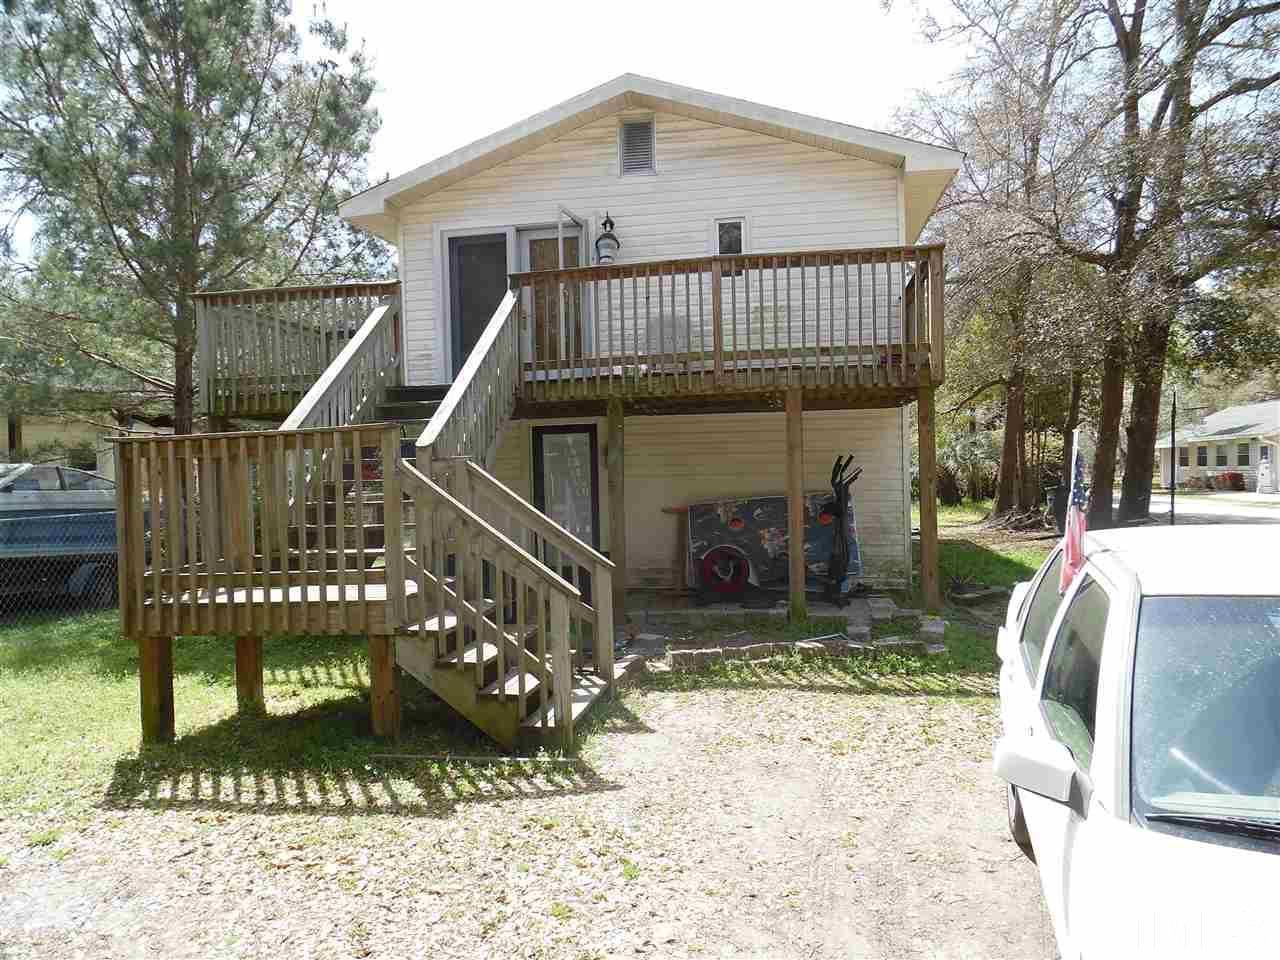 1538 Shady Rest Place, Shallotte, NC - USA (photo 1)